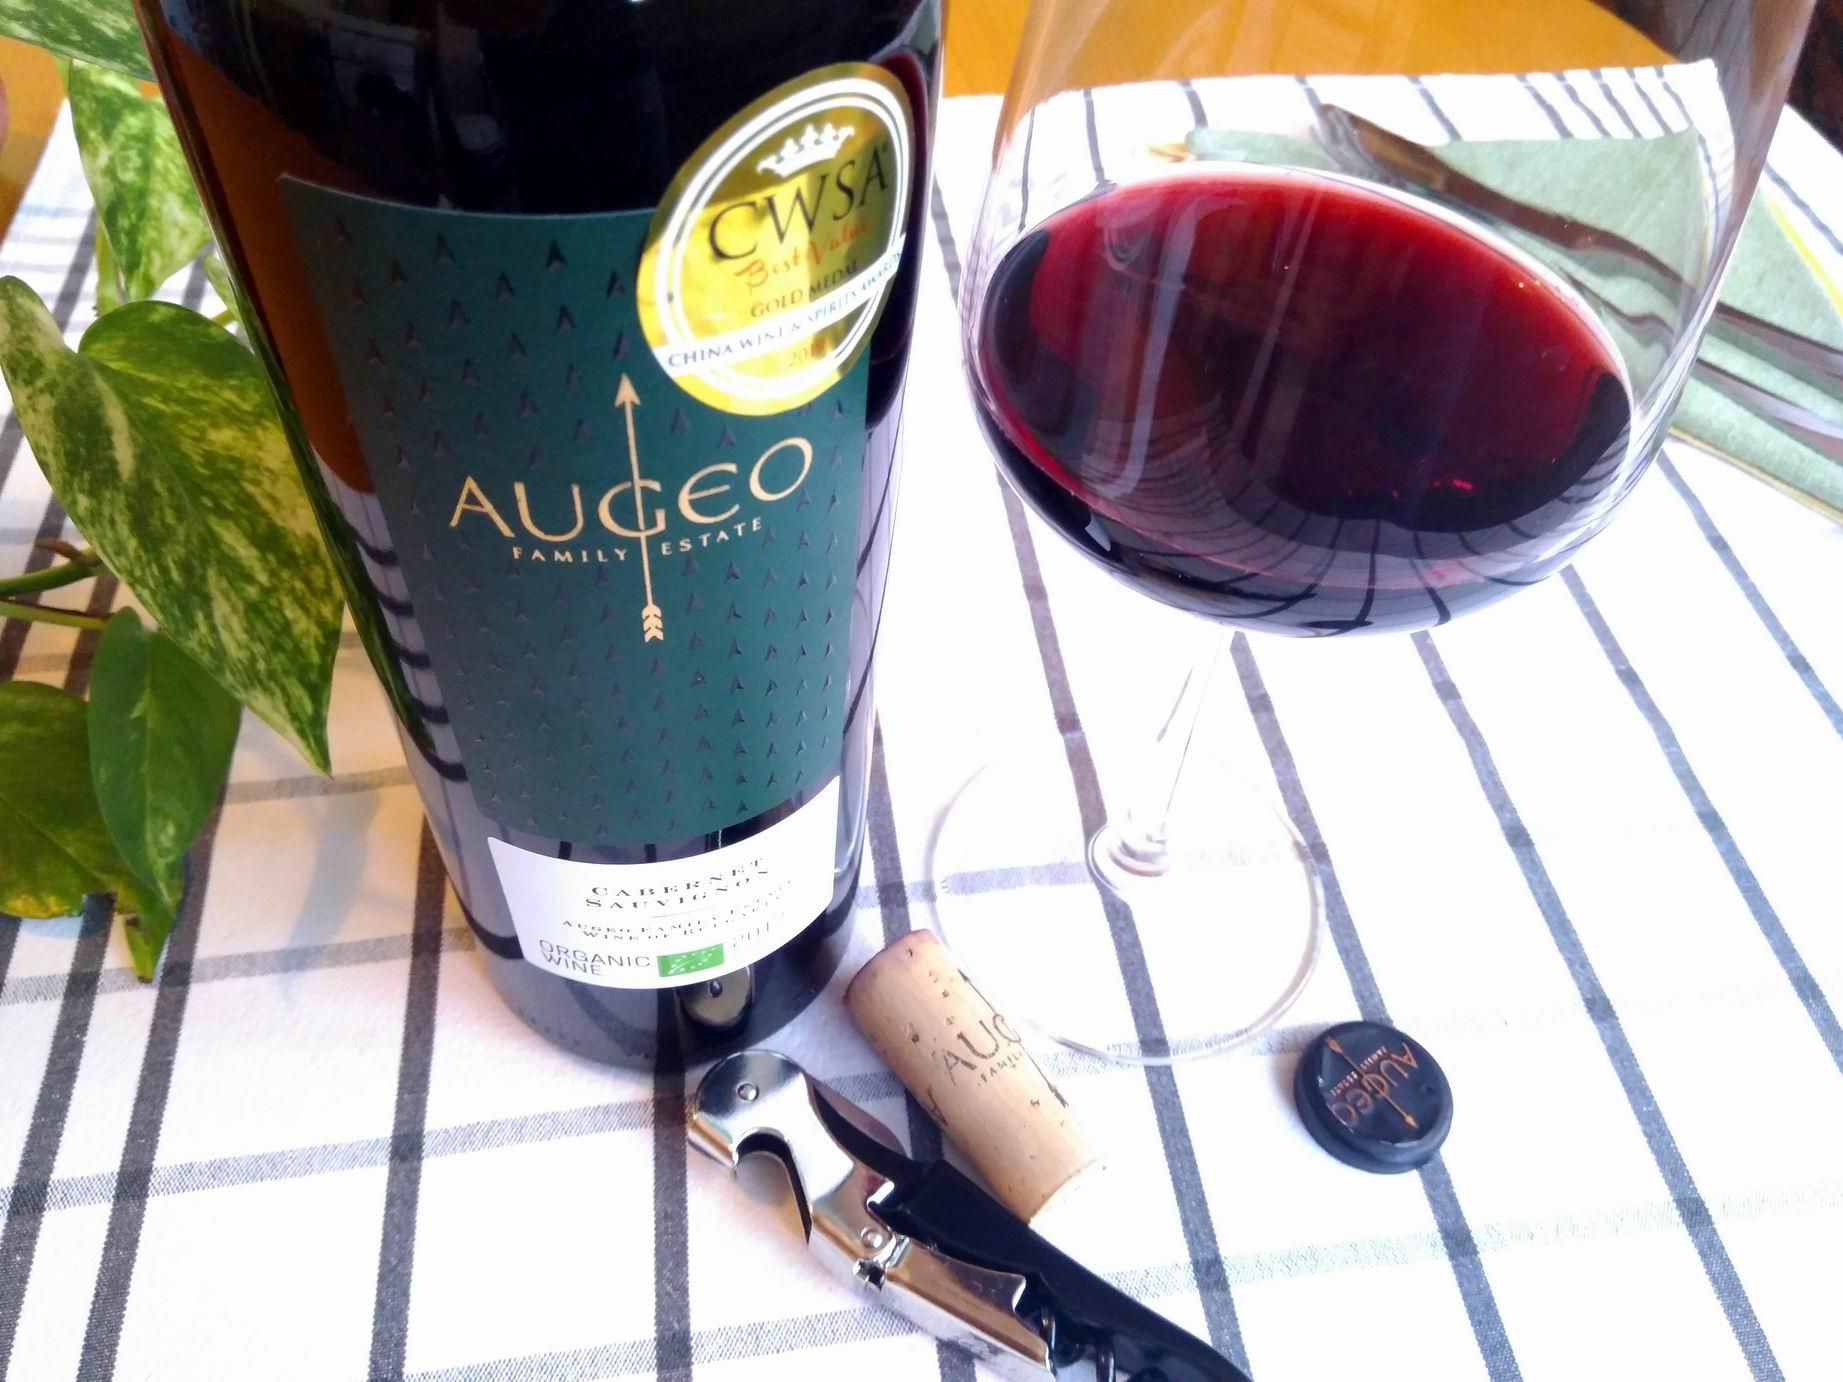 Cabernet Sauvignon 2017 Organic wine – Augeo Family Estate